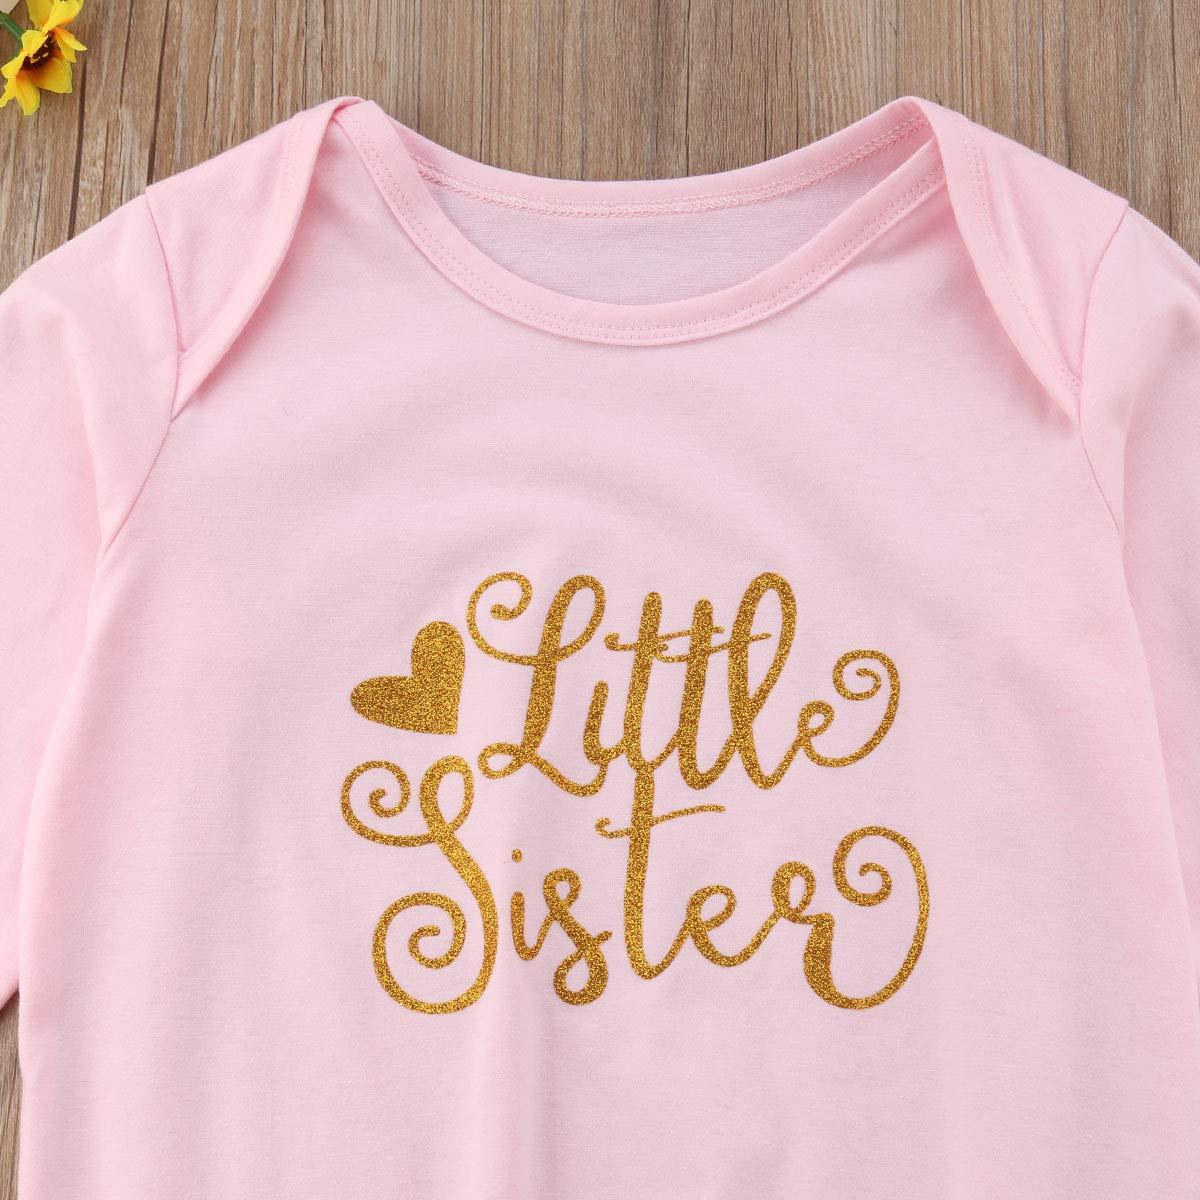 ZWINZ Little Sister Big Sister Matching Long Sleeve Sleeping Bag and Ruffle Dress Tops Set